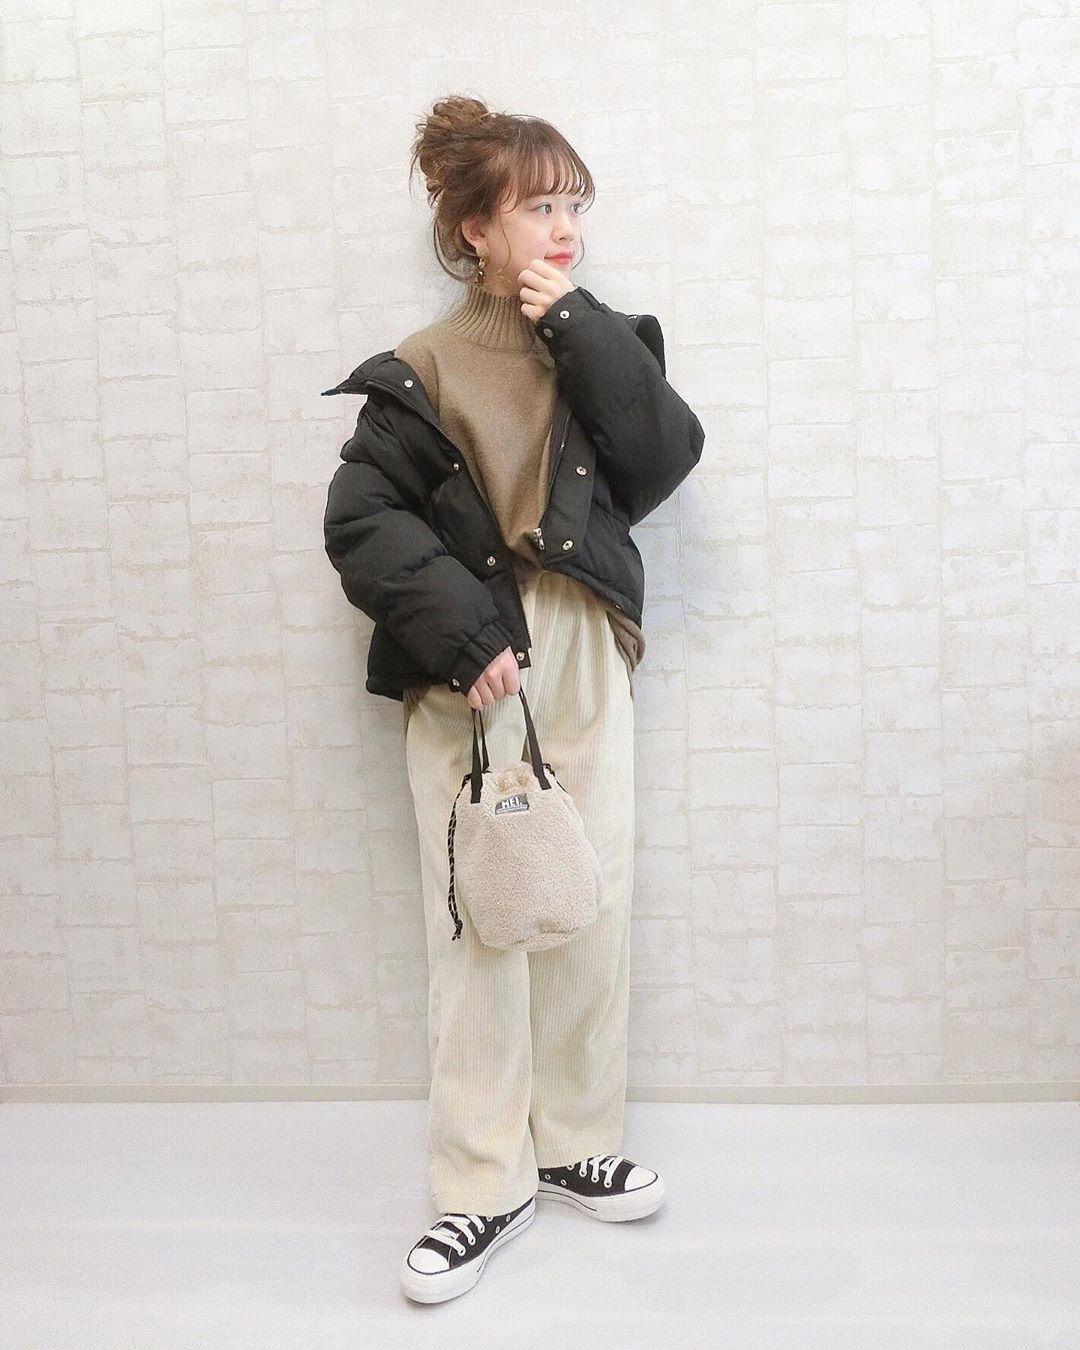 最高気温5度・最低気温0度 wear.chicchimoの服装